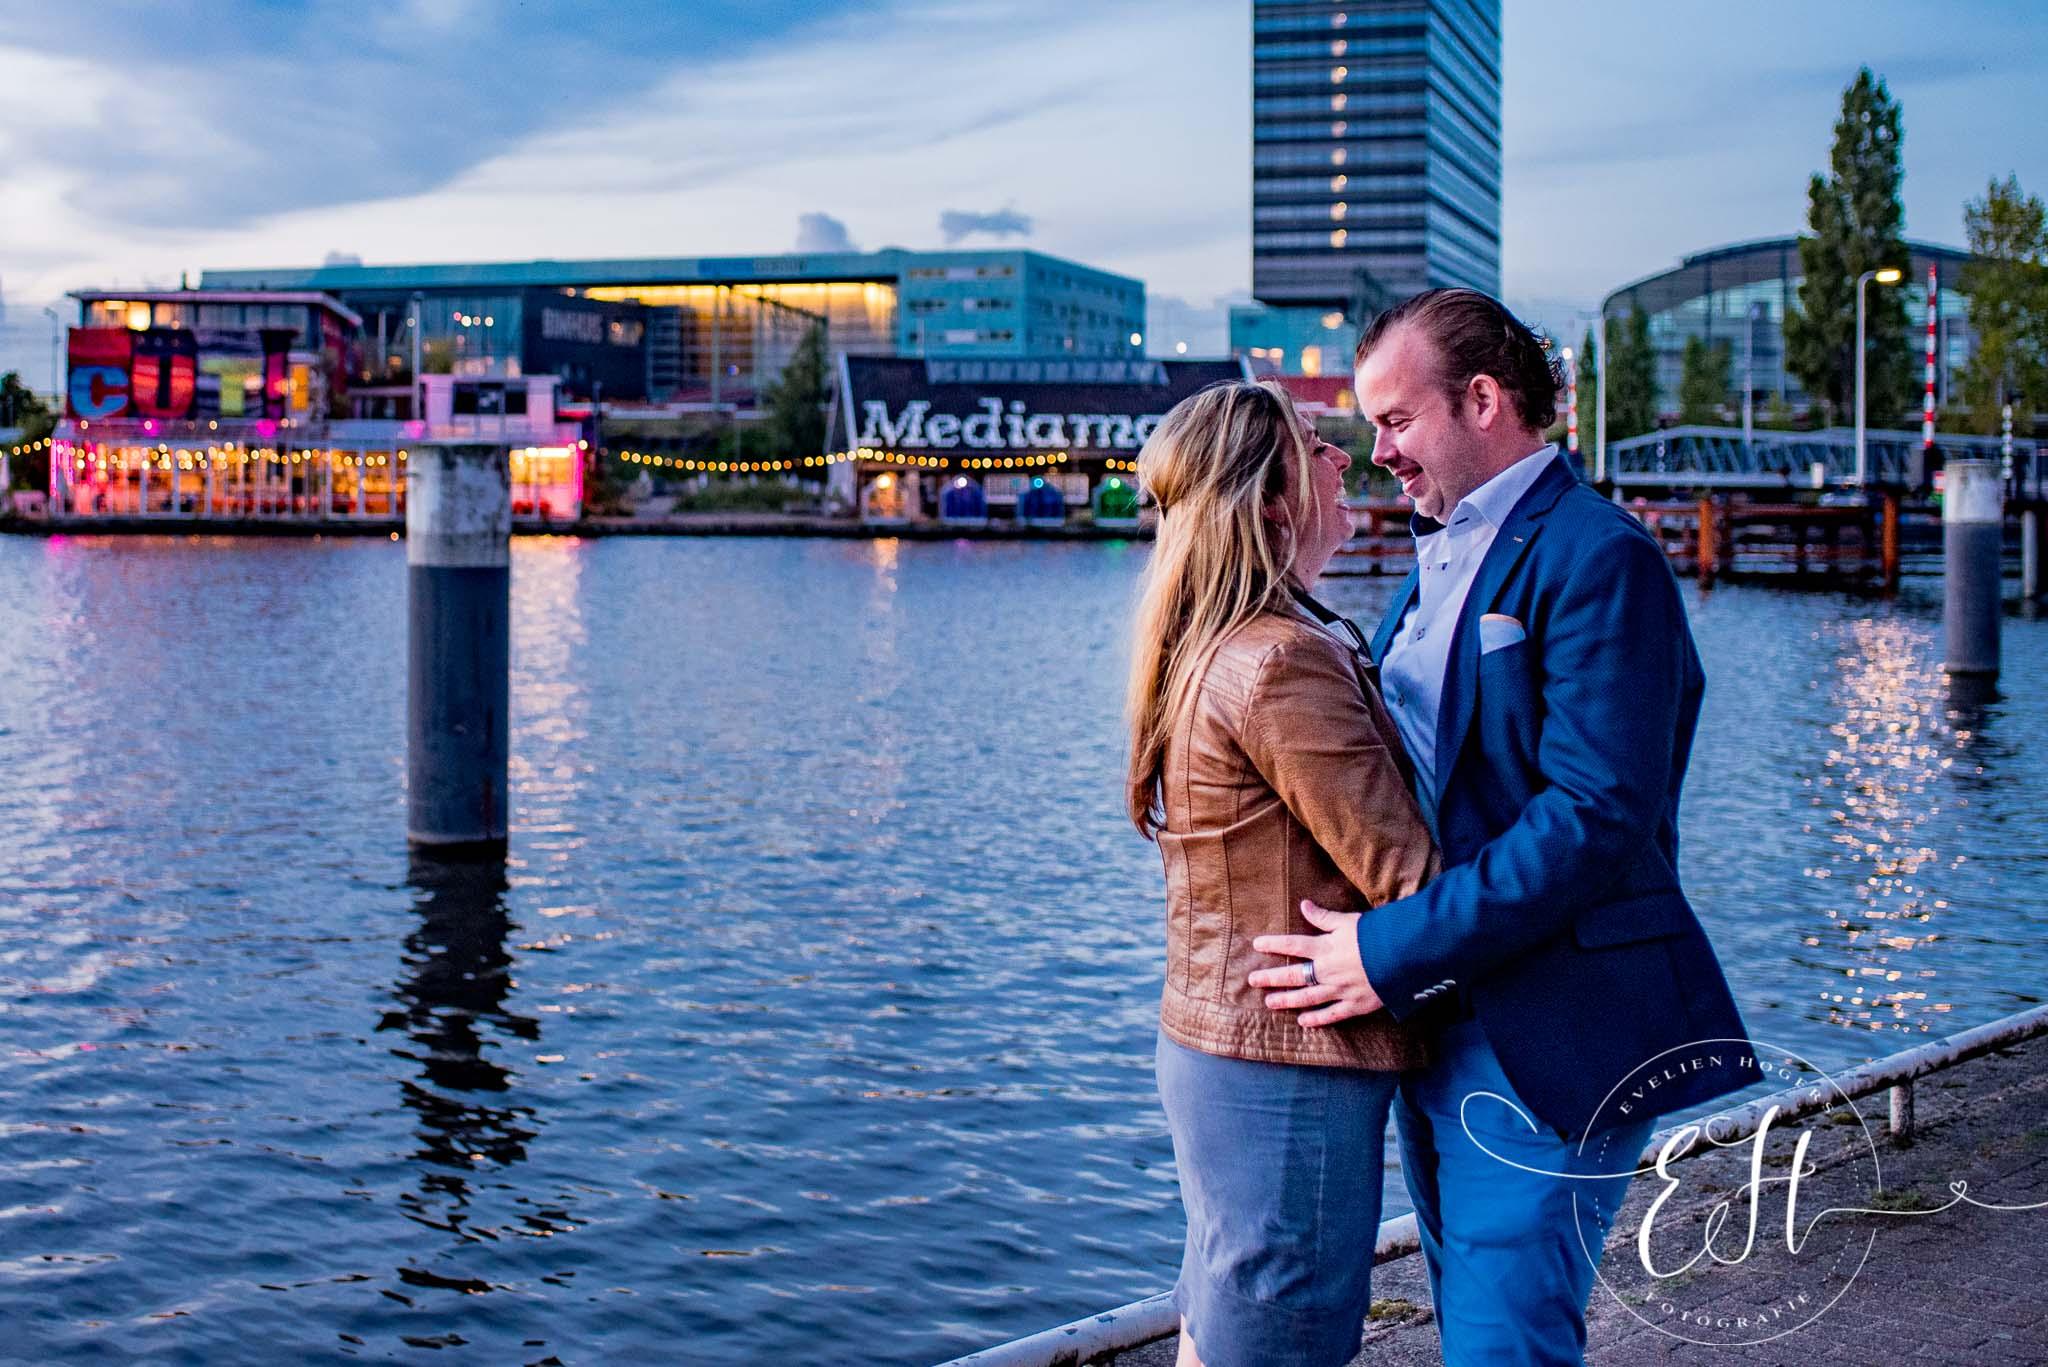 loveshoot-in-amsterdam-evelien-hogers-fotografie (18 van 26).jpg